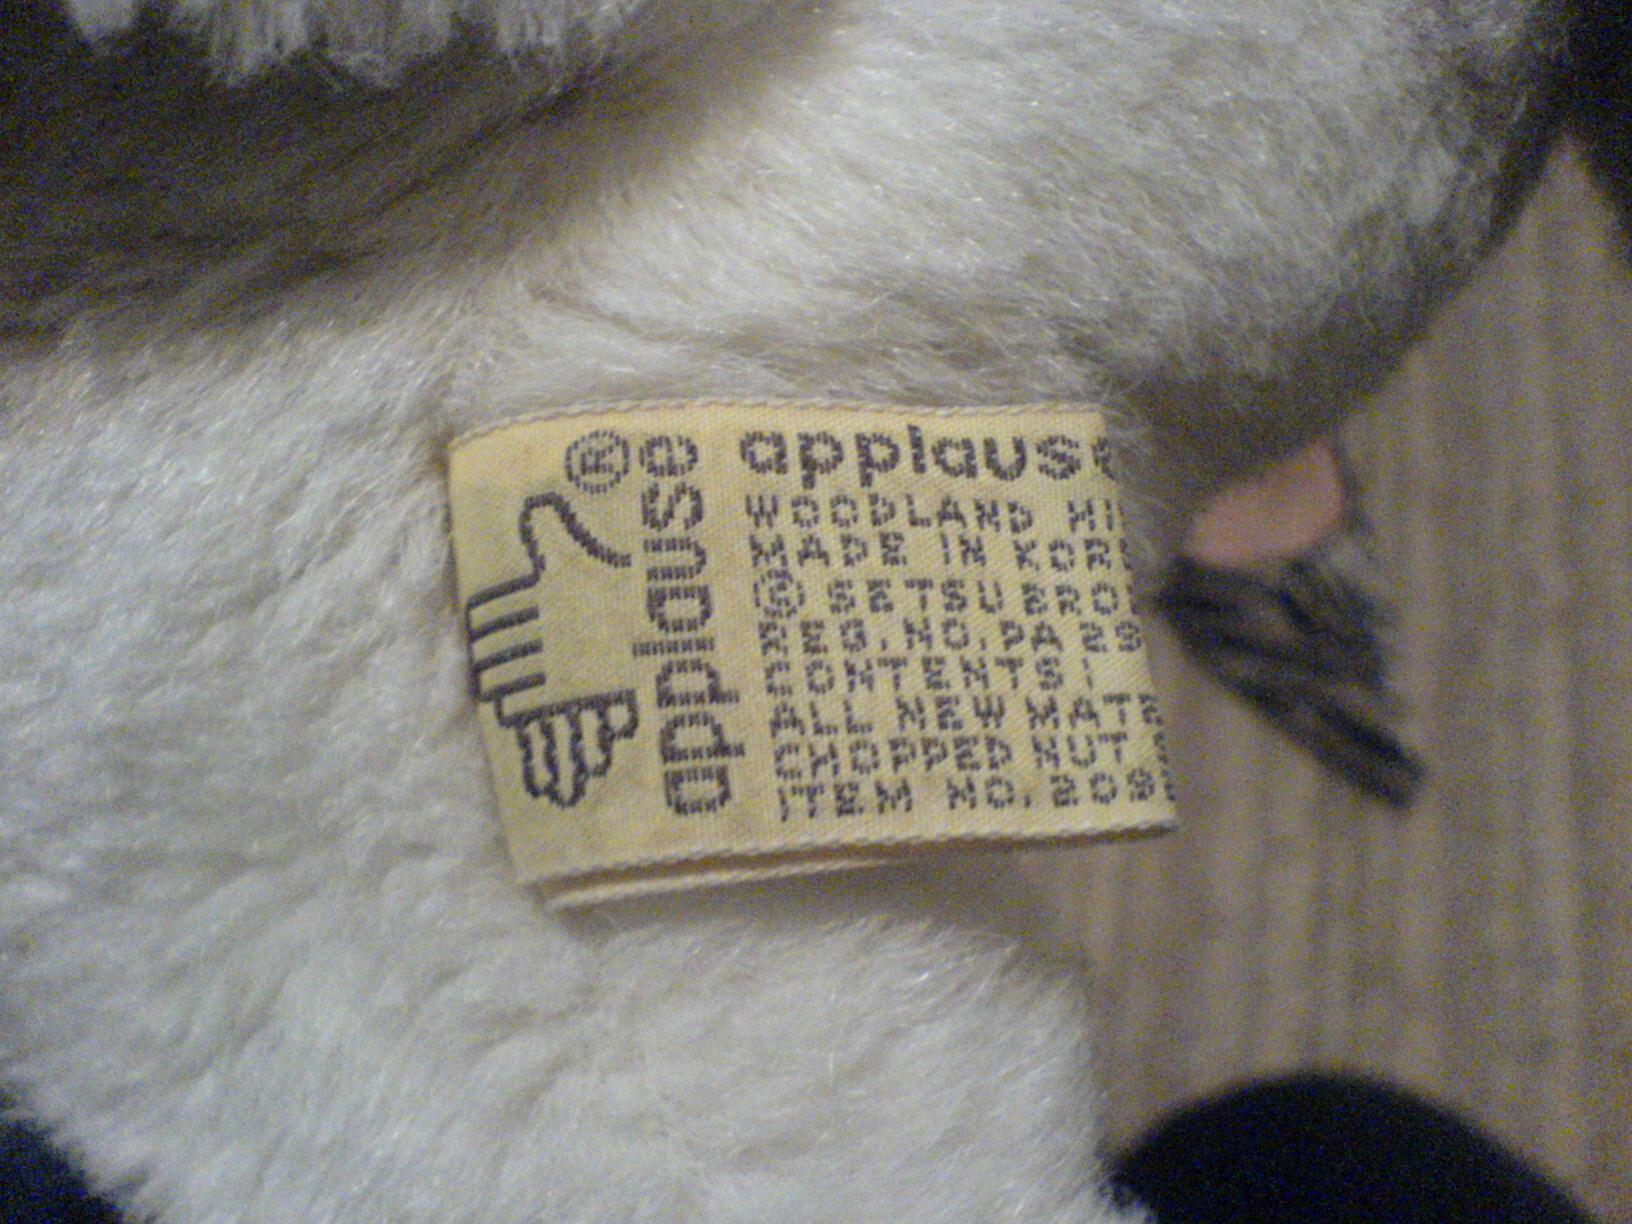 Applause Floppy Cat?